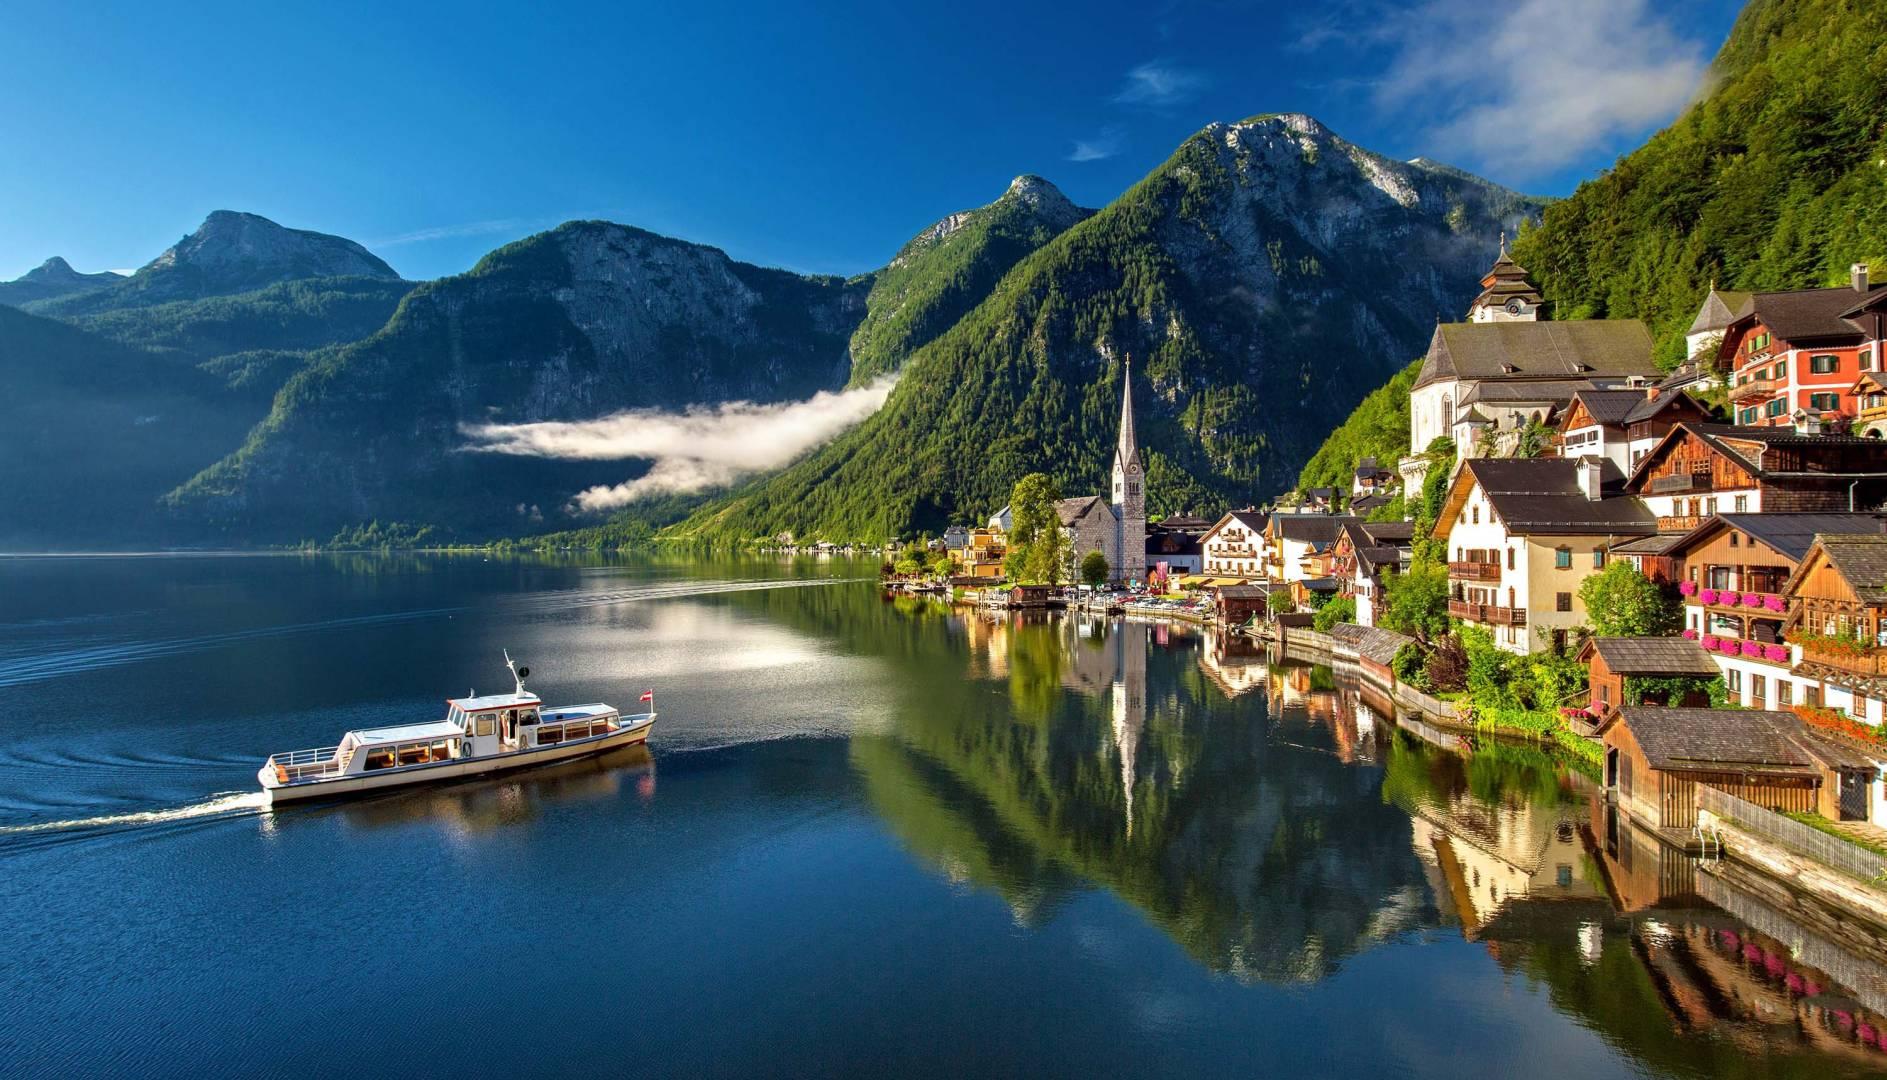 Custom-Travel-Planner-Network-Austria-hallstatt